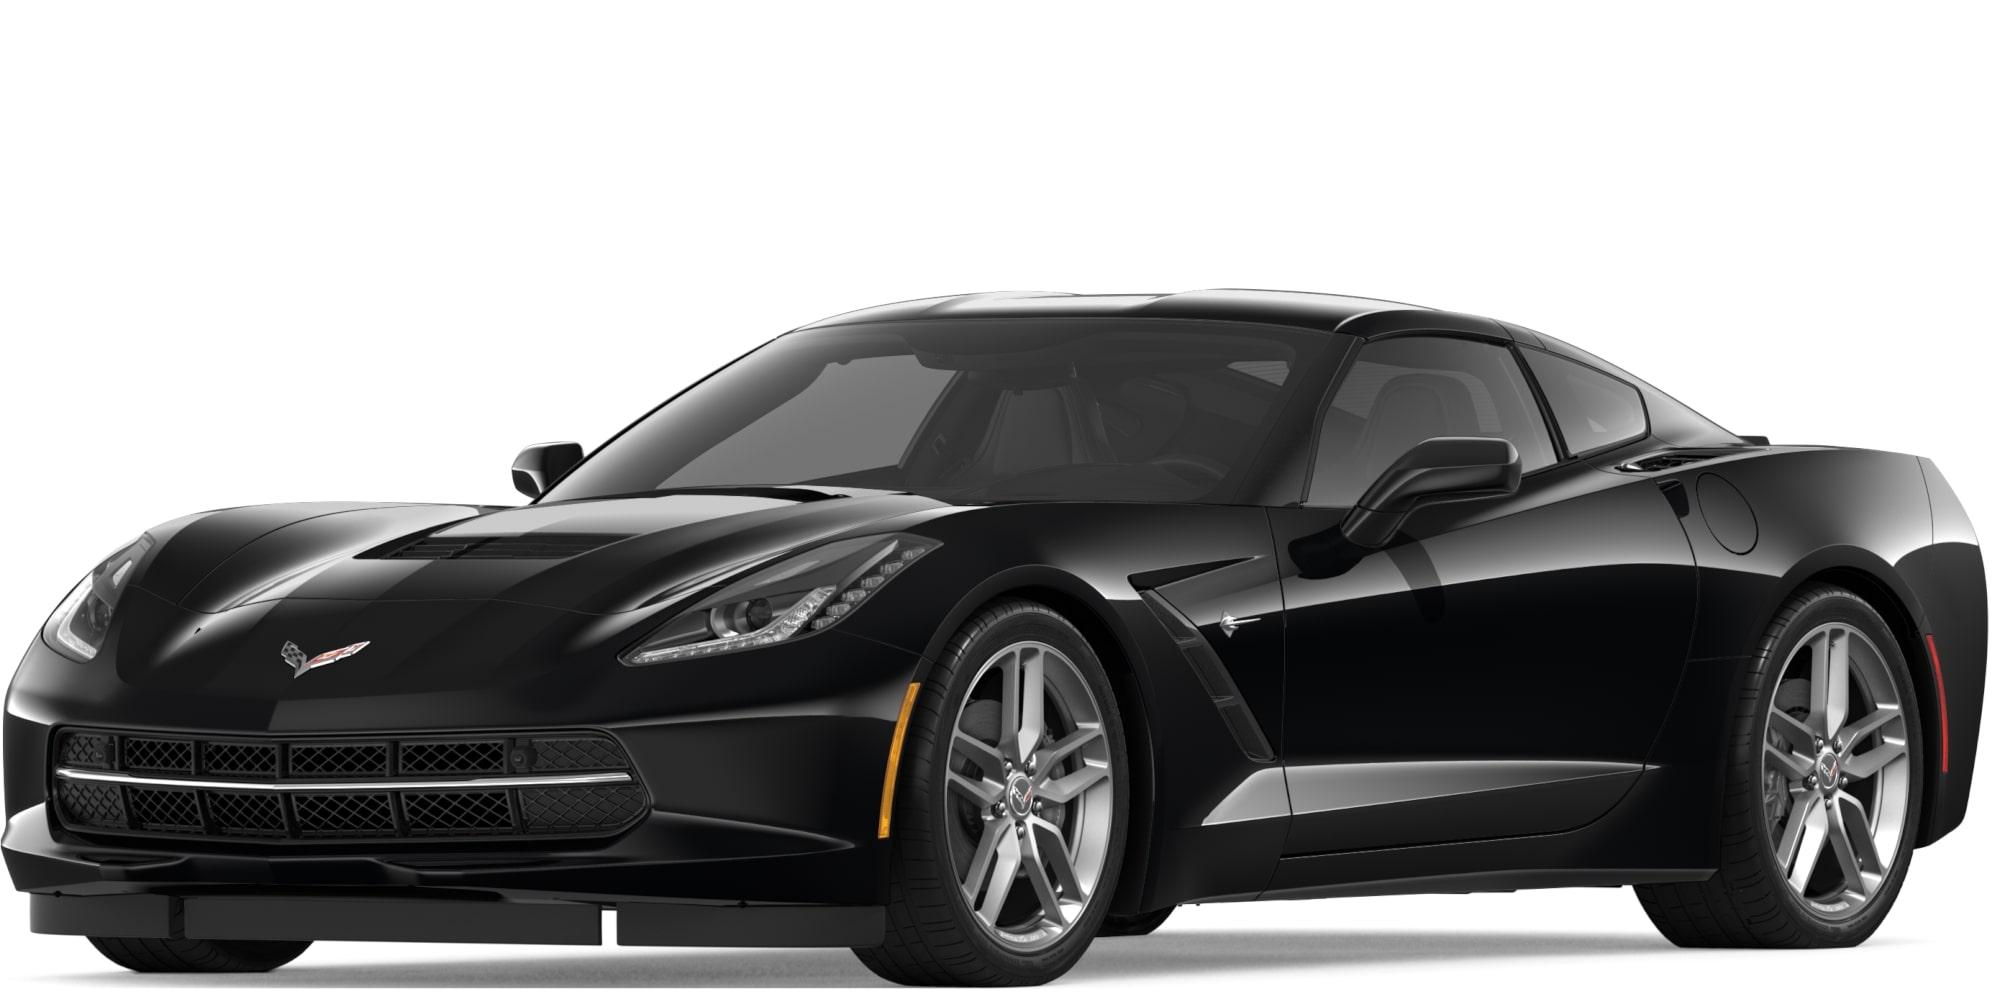 2019 Chevrolet Corvette Sacramento